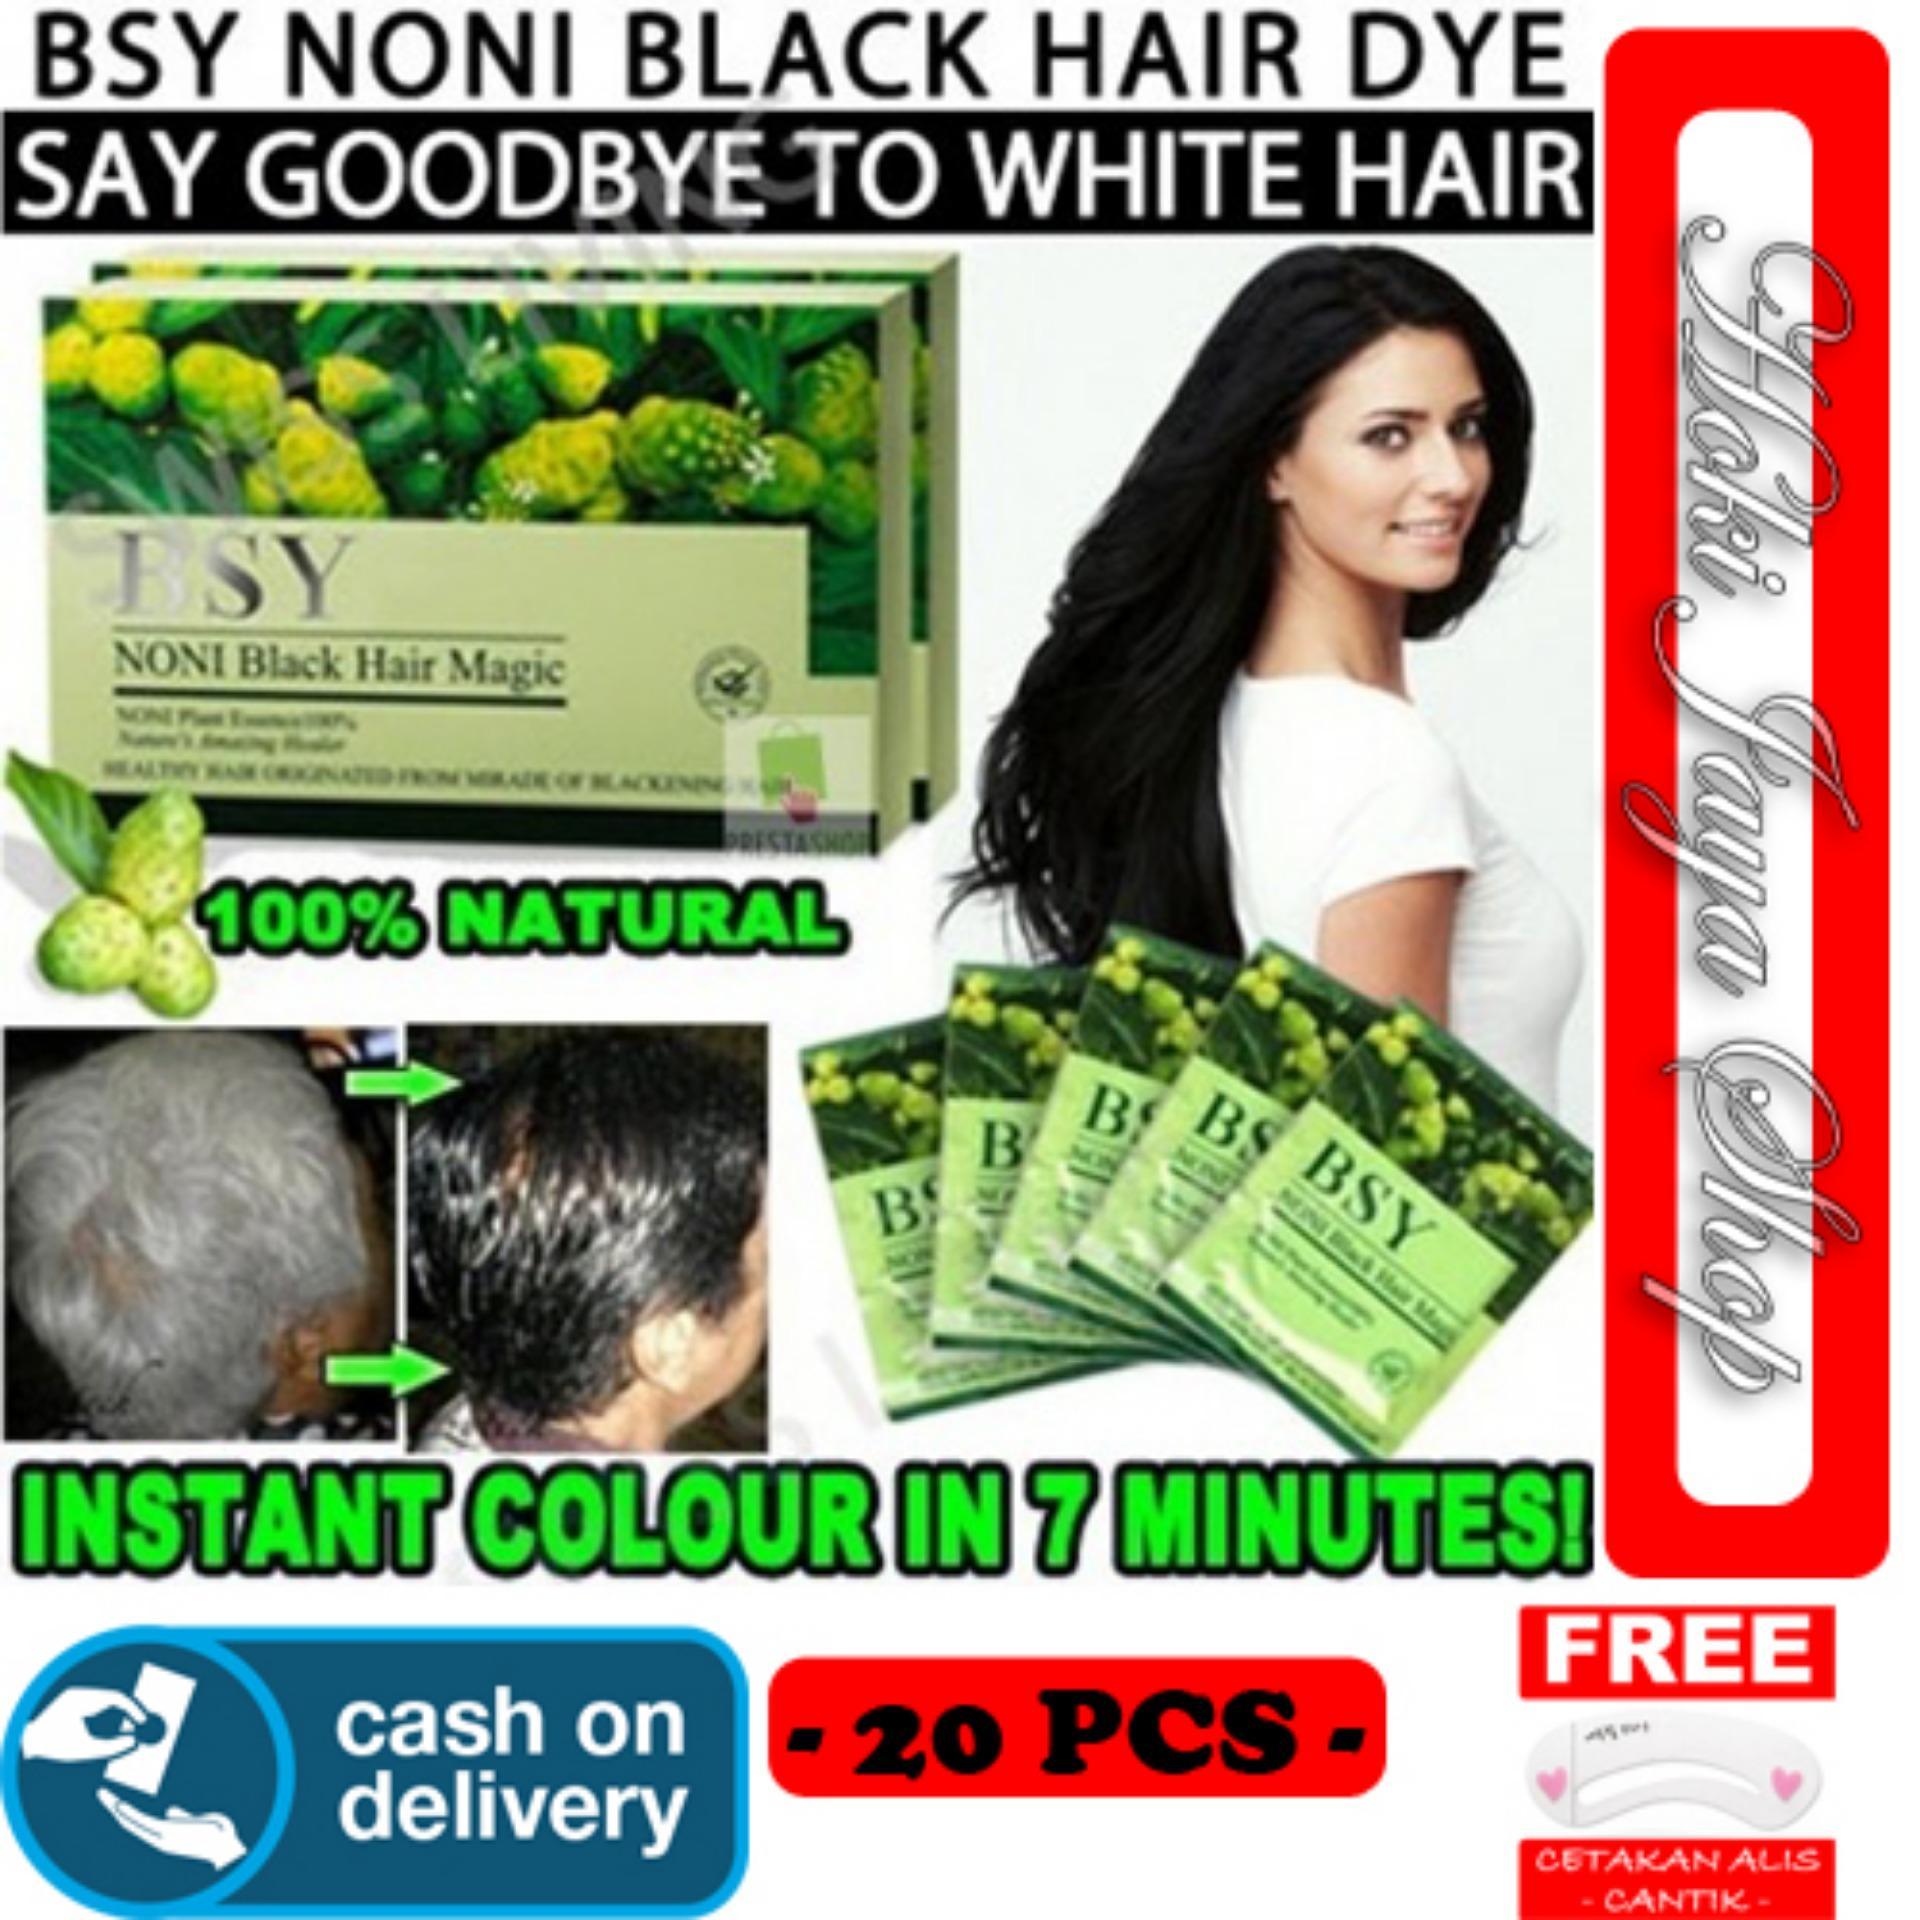 HOKI COD - BSY Noni Black Hair Magic Shampo - Cat Rambut Hitam - Penghitam Rambut - 20 PCS + Gratis Cetak Alis Cantik - Premium